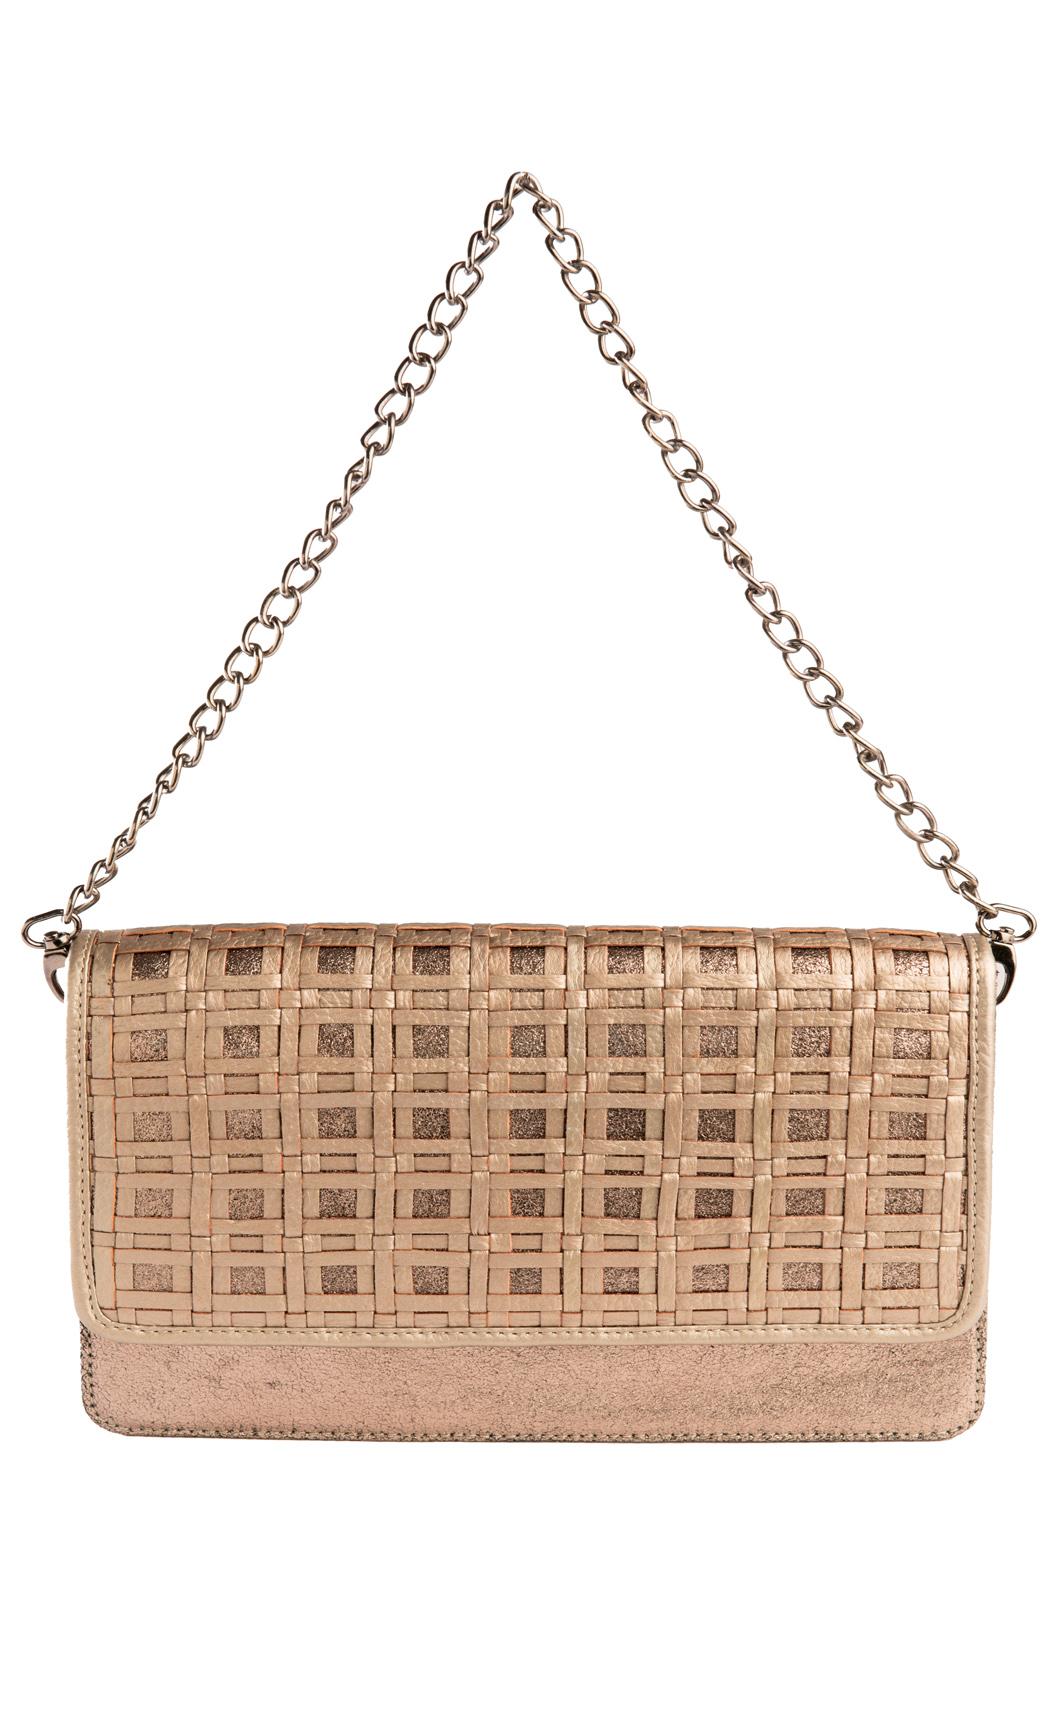 Check Weave Shoulder Bag in Gunmetal. Buy Online